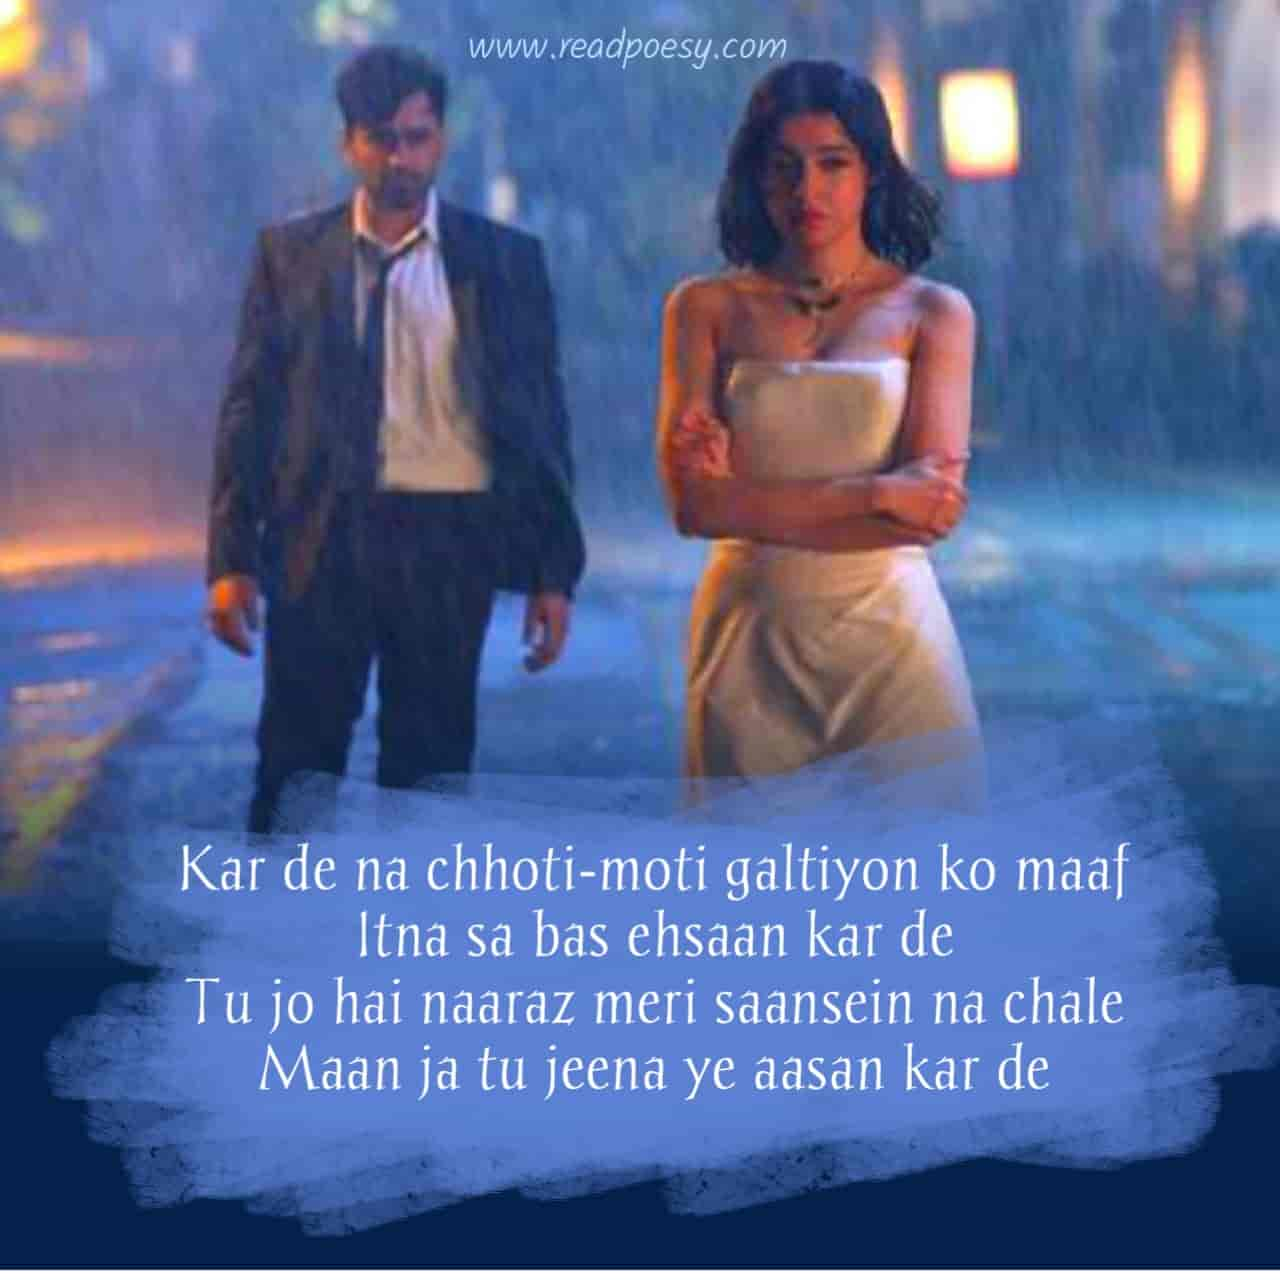 Teri Aankhon Mein Love Song Lyrics, Sung By Darshan Raval And Neha Kakkar.